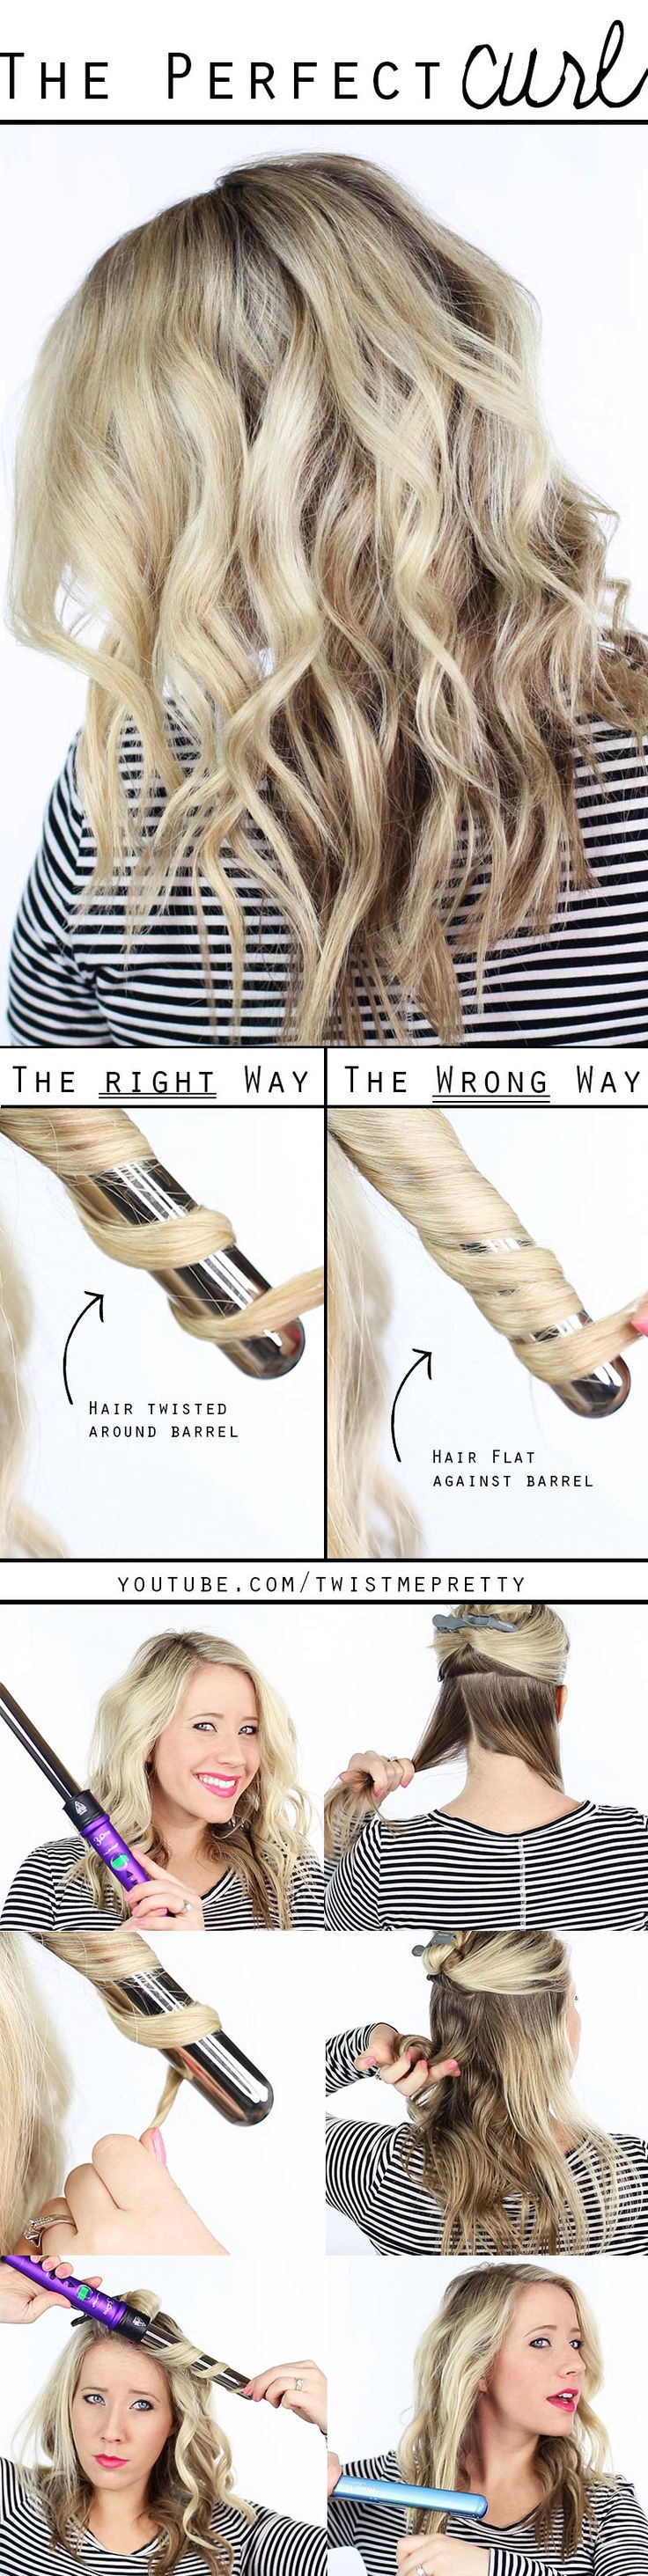 279 best Hair styles images on Pinterest